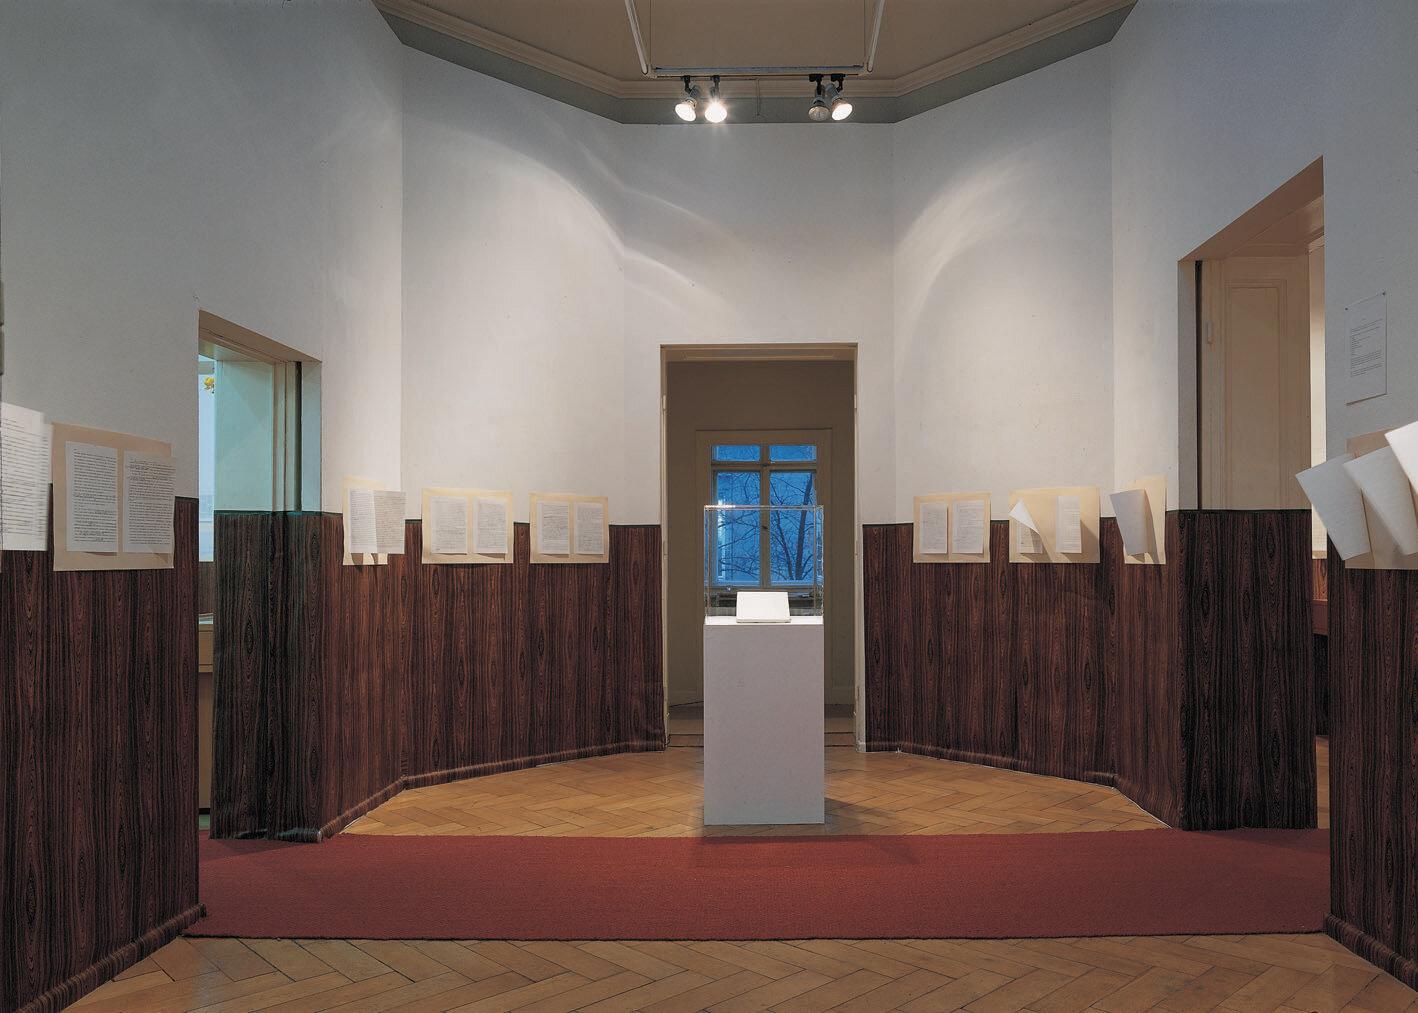 View-of-installation-daad-Galerie-Berlin-1989-Photo-by-Werner-Zellien-3.jpg